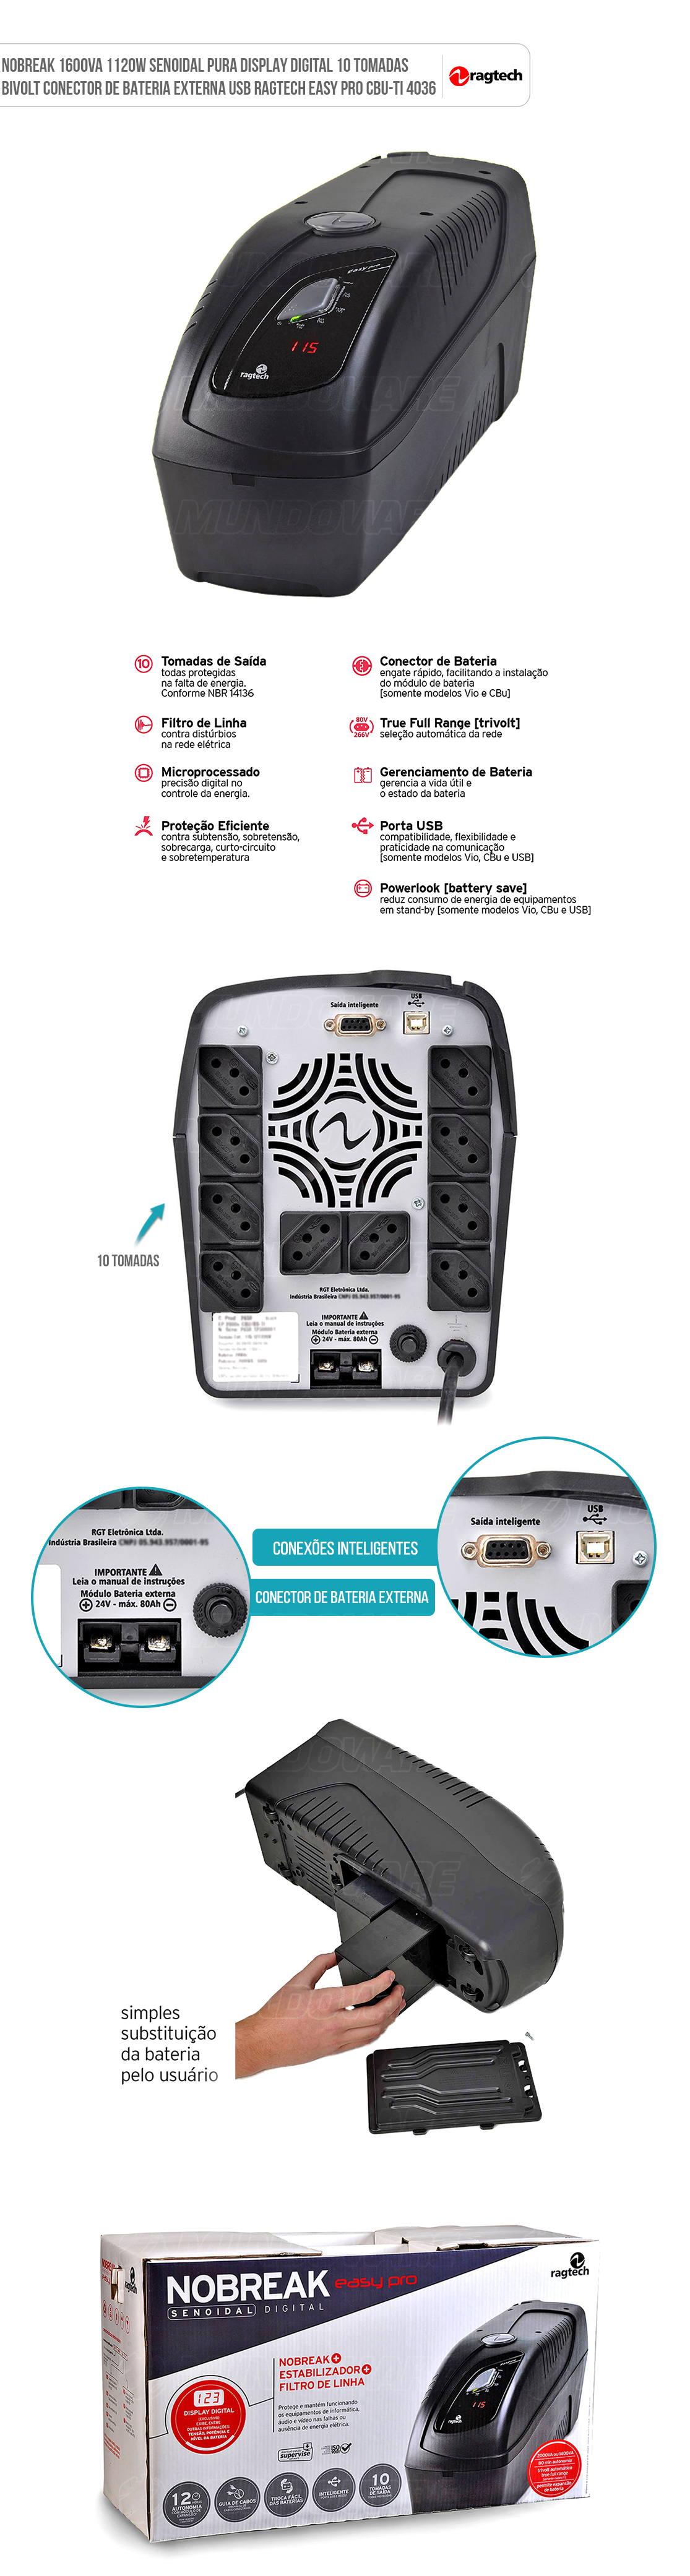 Nobreak 1600VA 1120W Senoidal Pura Display Digital 10 Tomadas E.115/127/220V S.115V Conector de Bateria Externa USB Ragtech Easy Pro NEP 1600d CBU-TI 4036